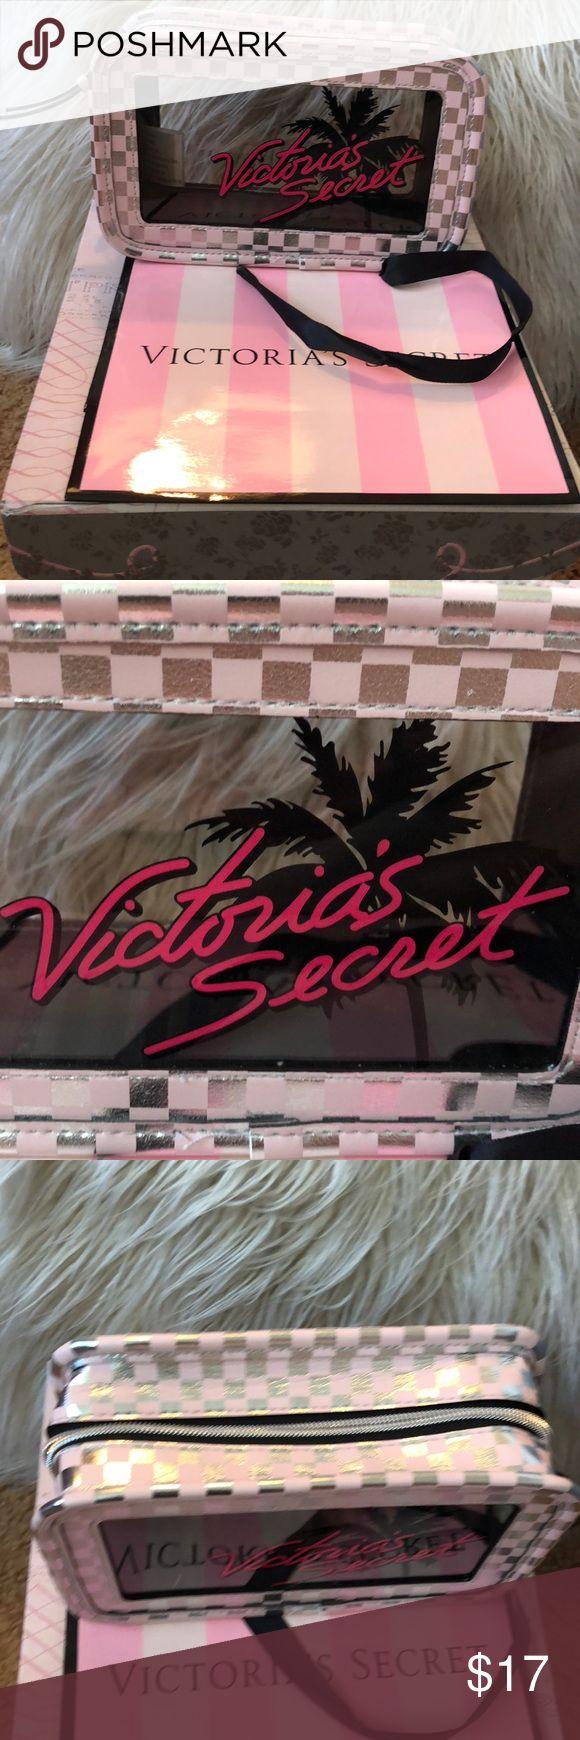 Victoria Secret palm tree 🌴 makeup 💄 bag. New. Victoria Secret palm tree …